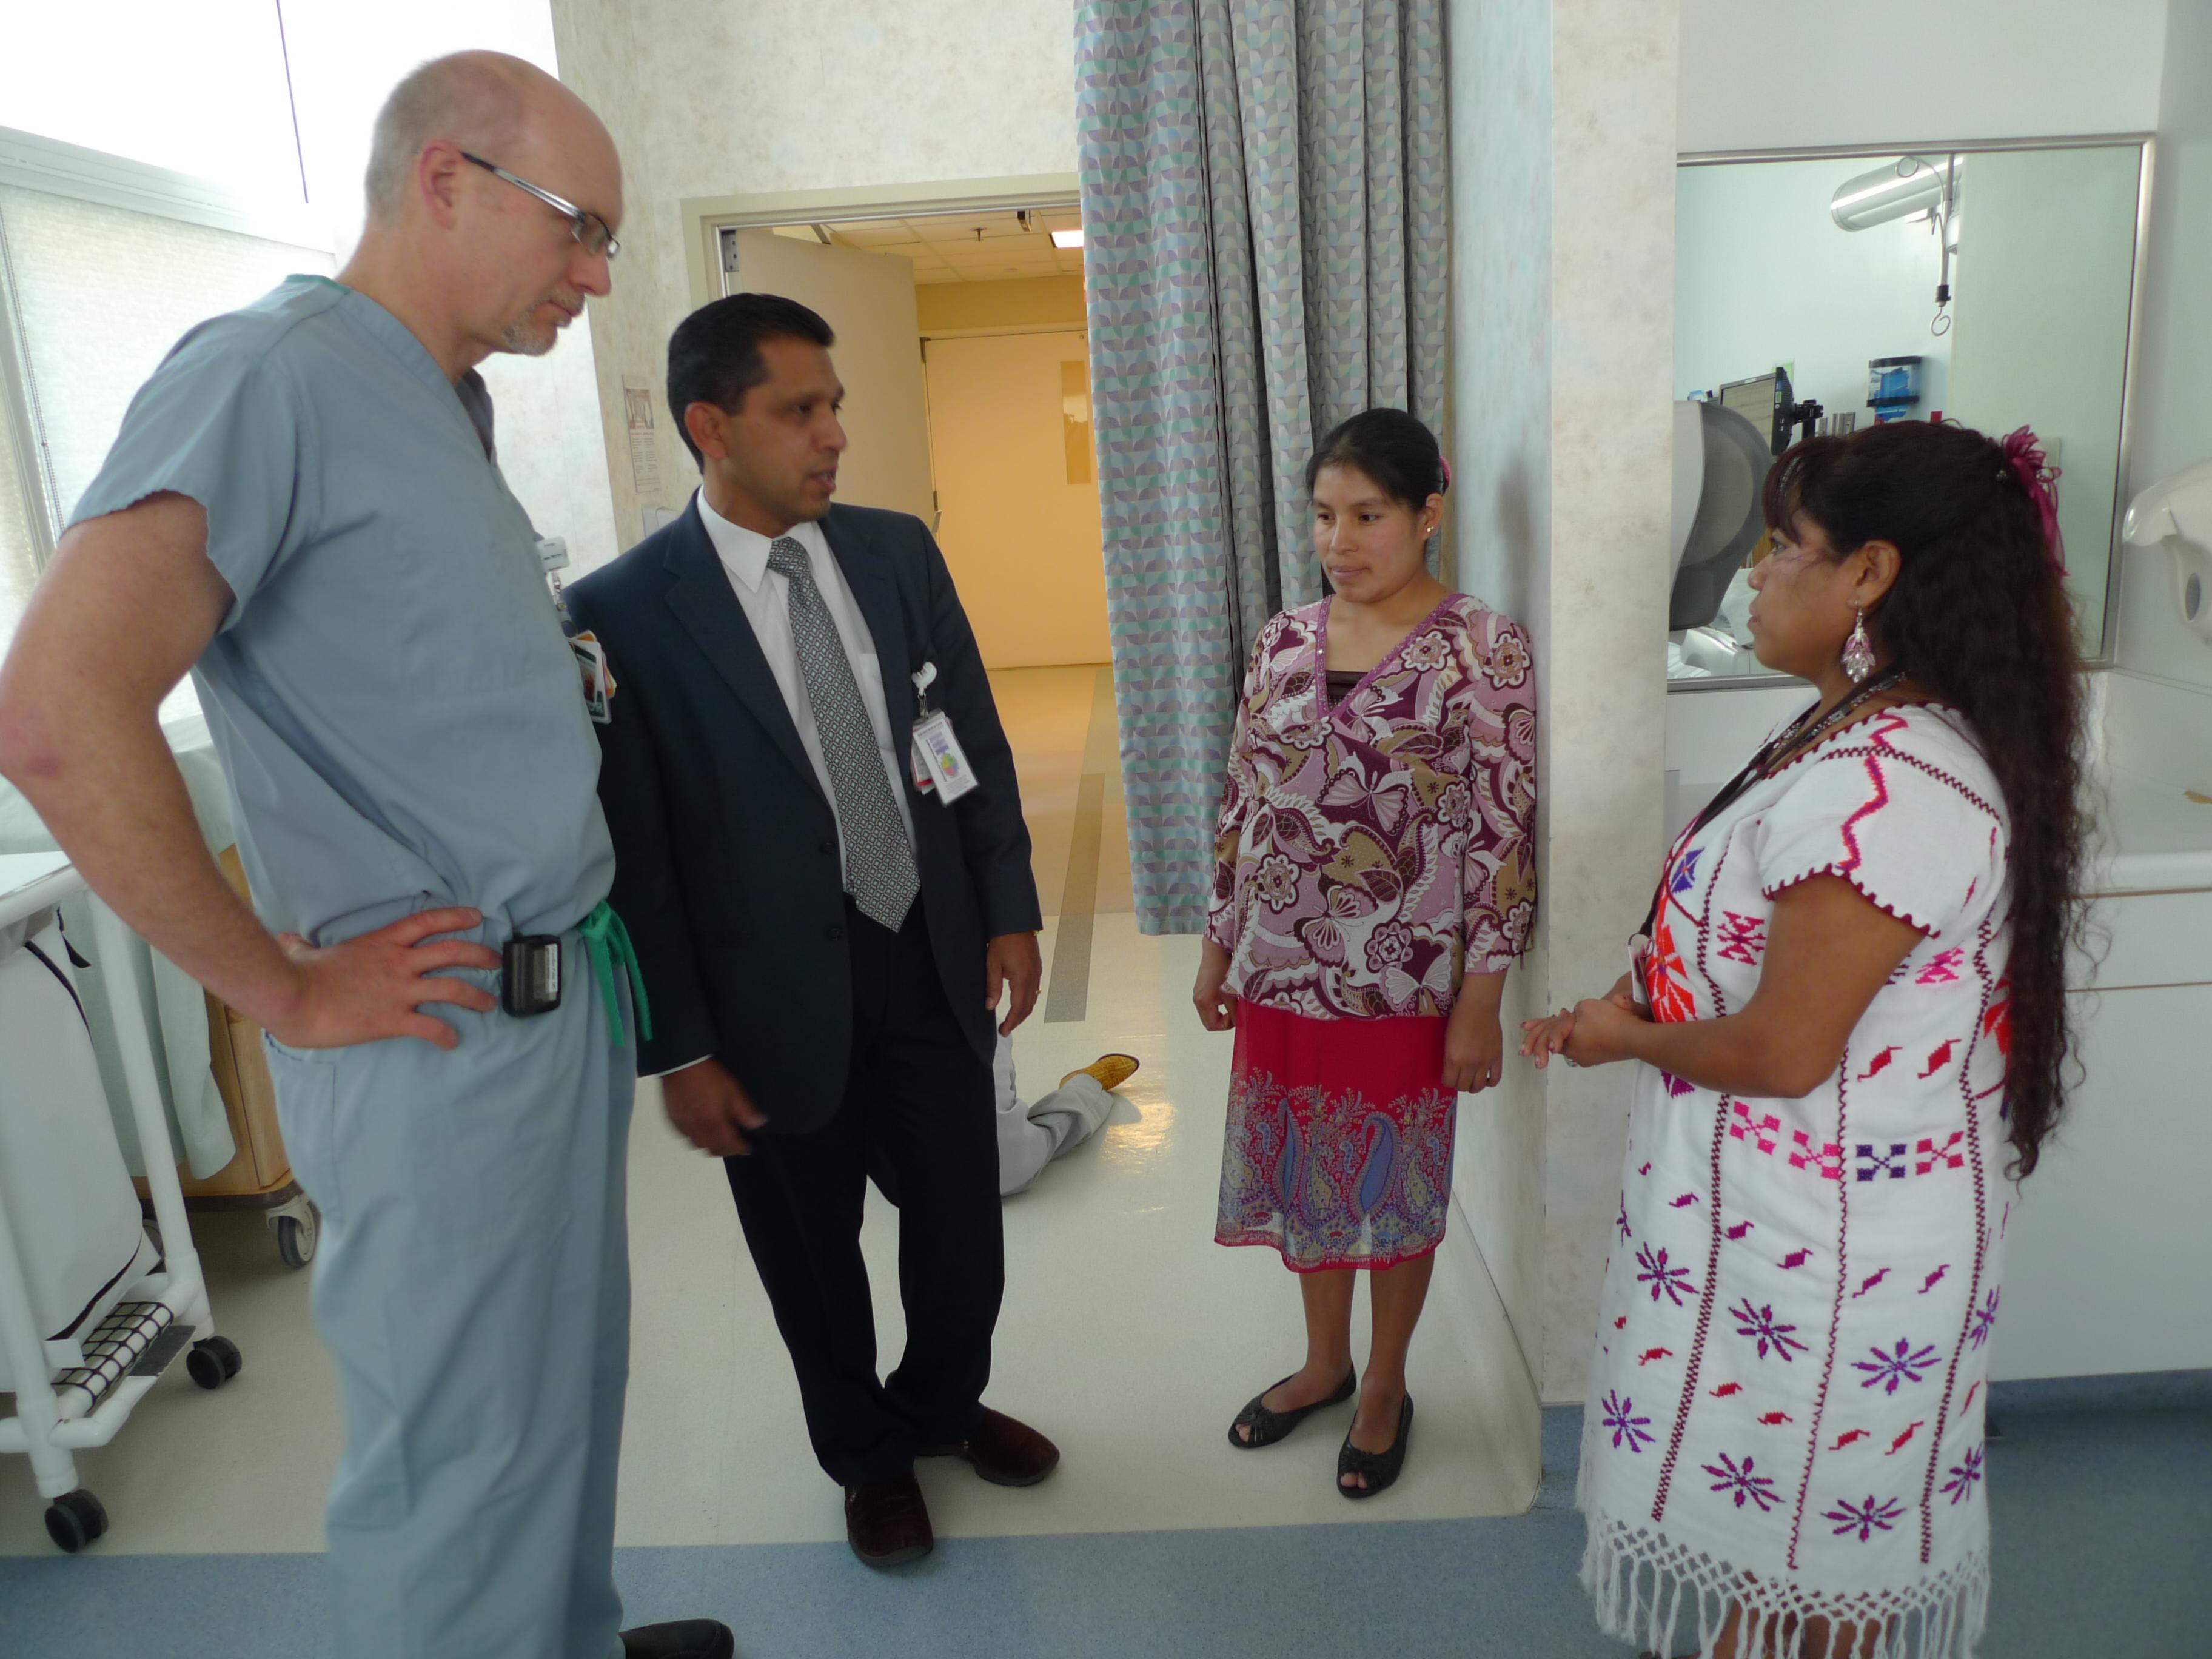 Caption: Interpreters help doctors communicate with patients., Credit: Lisa Morehouse